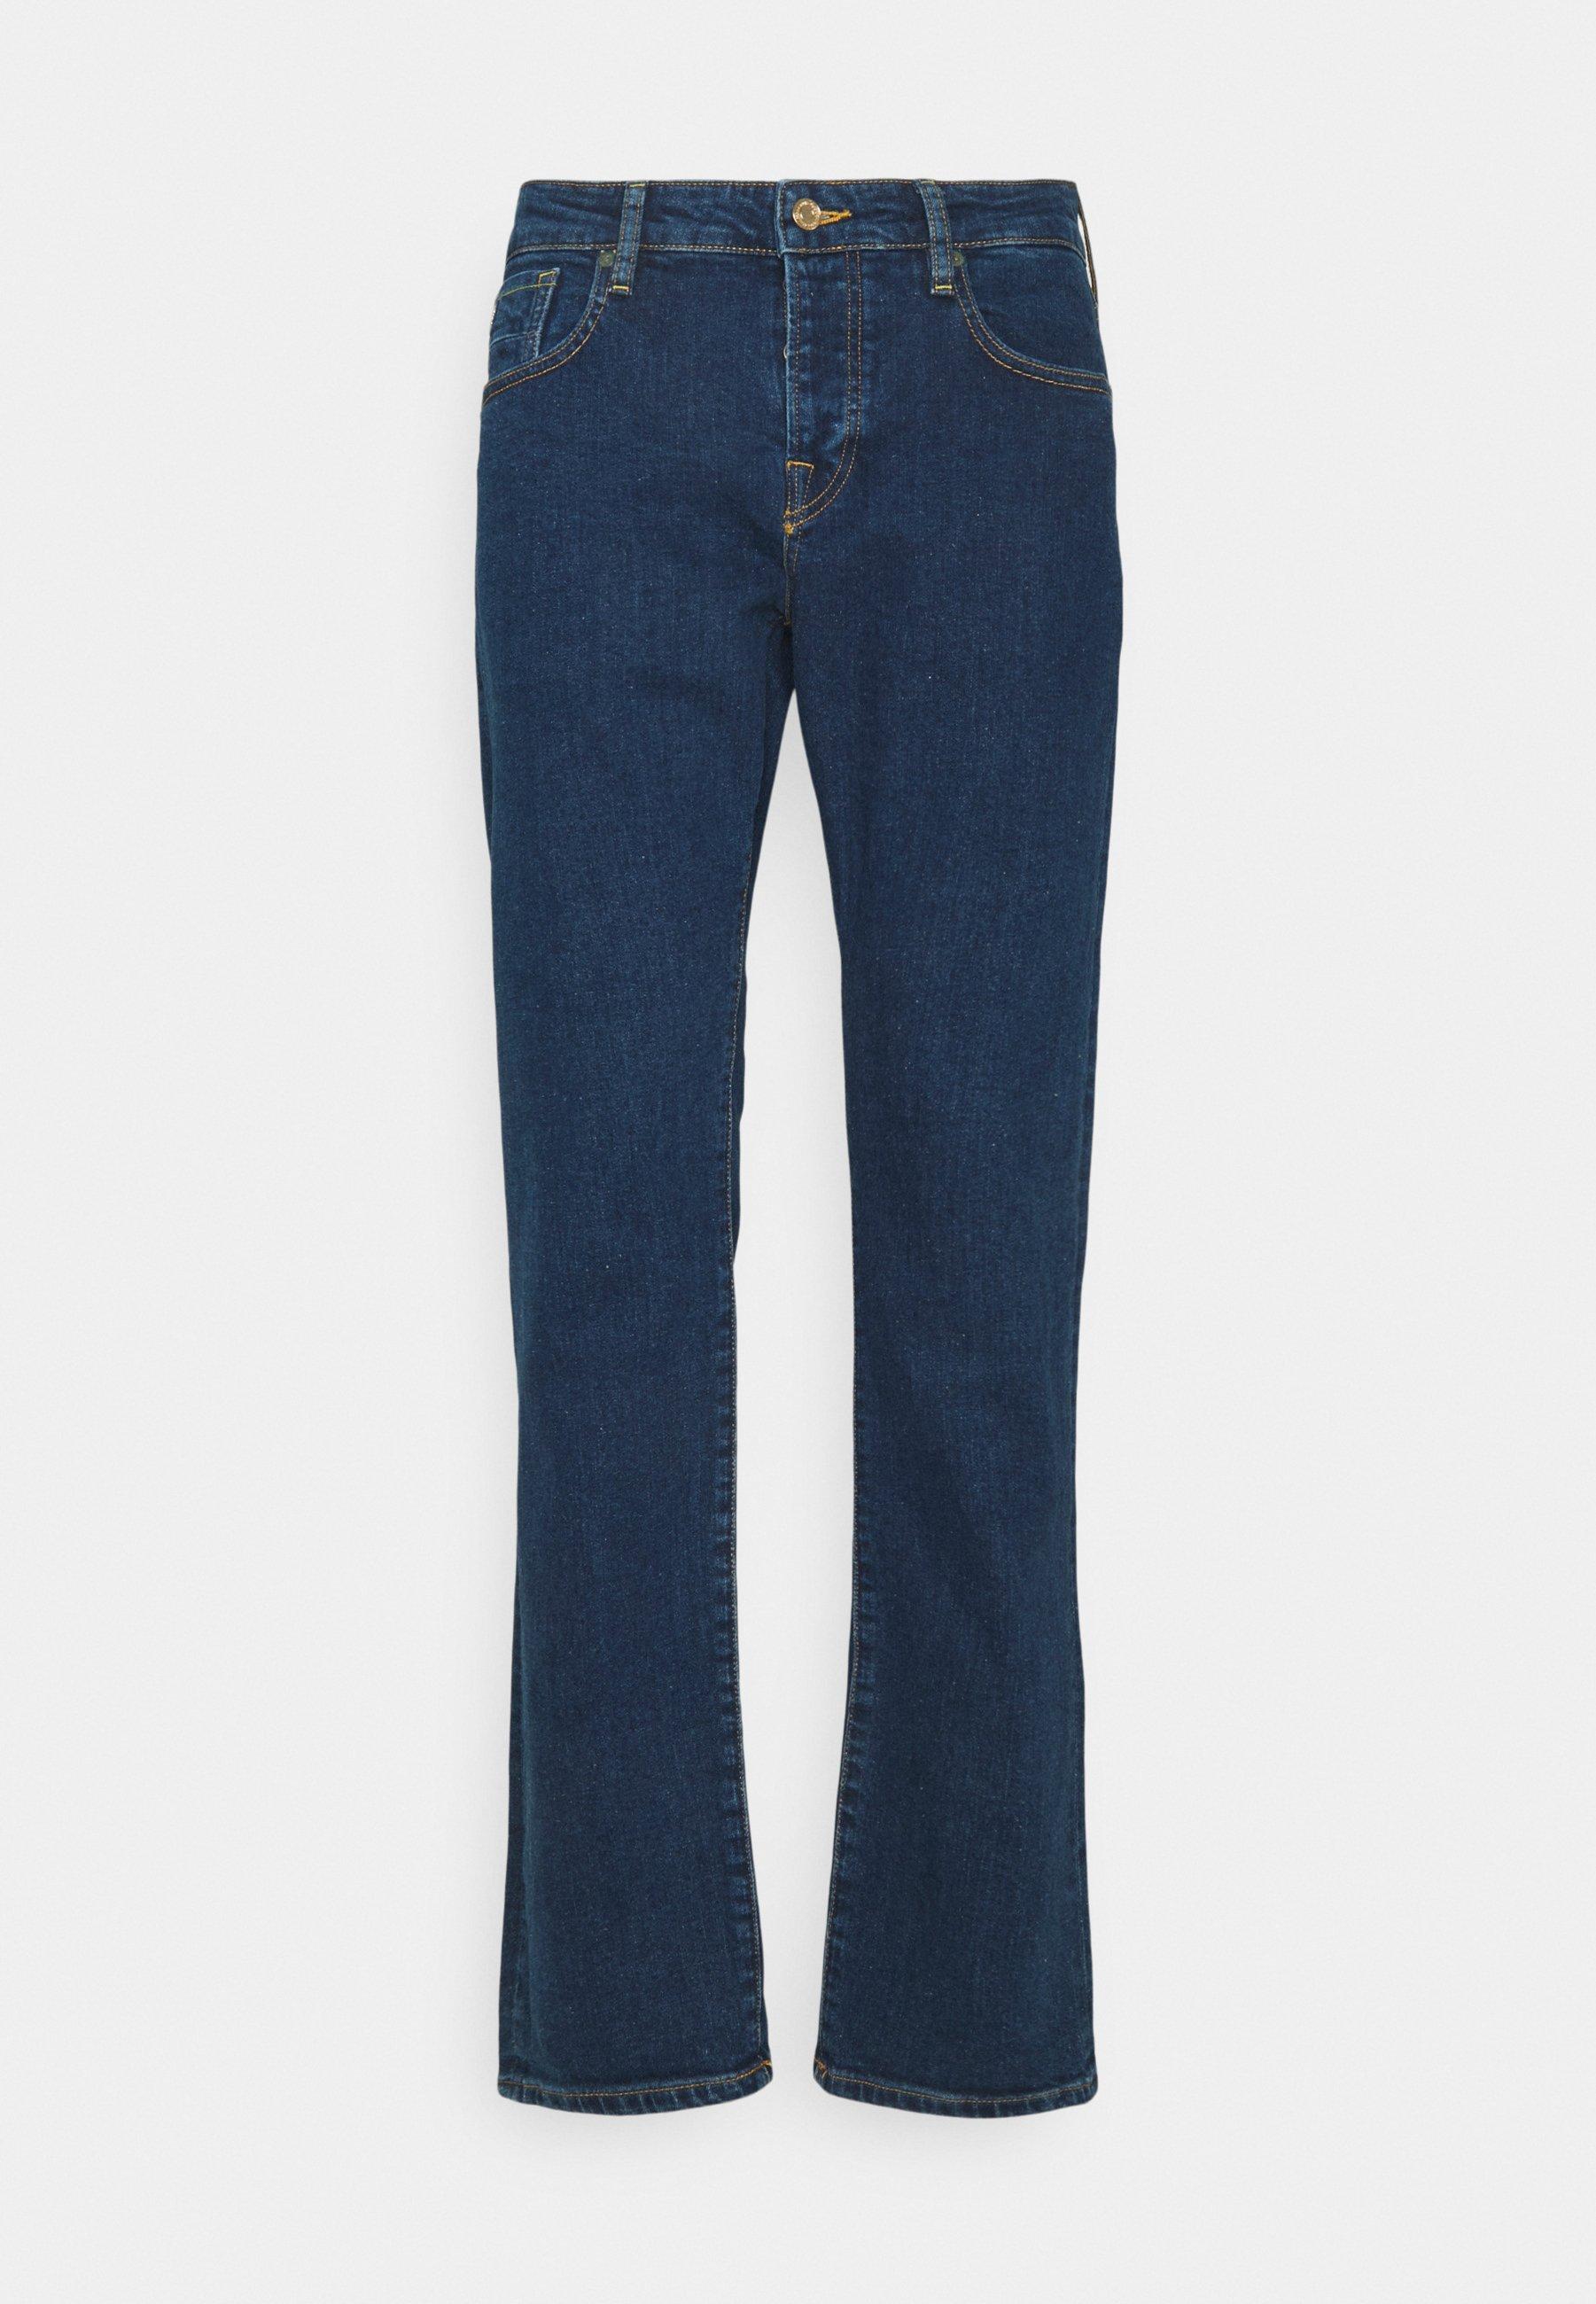 Herren Flared Jeans